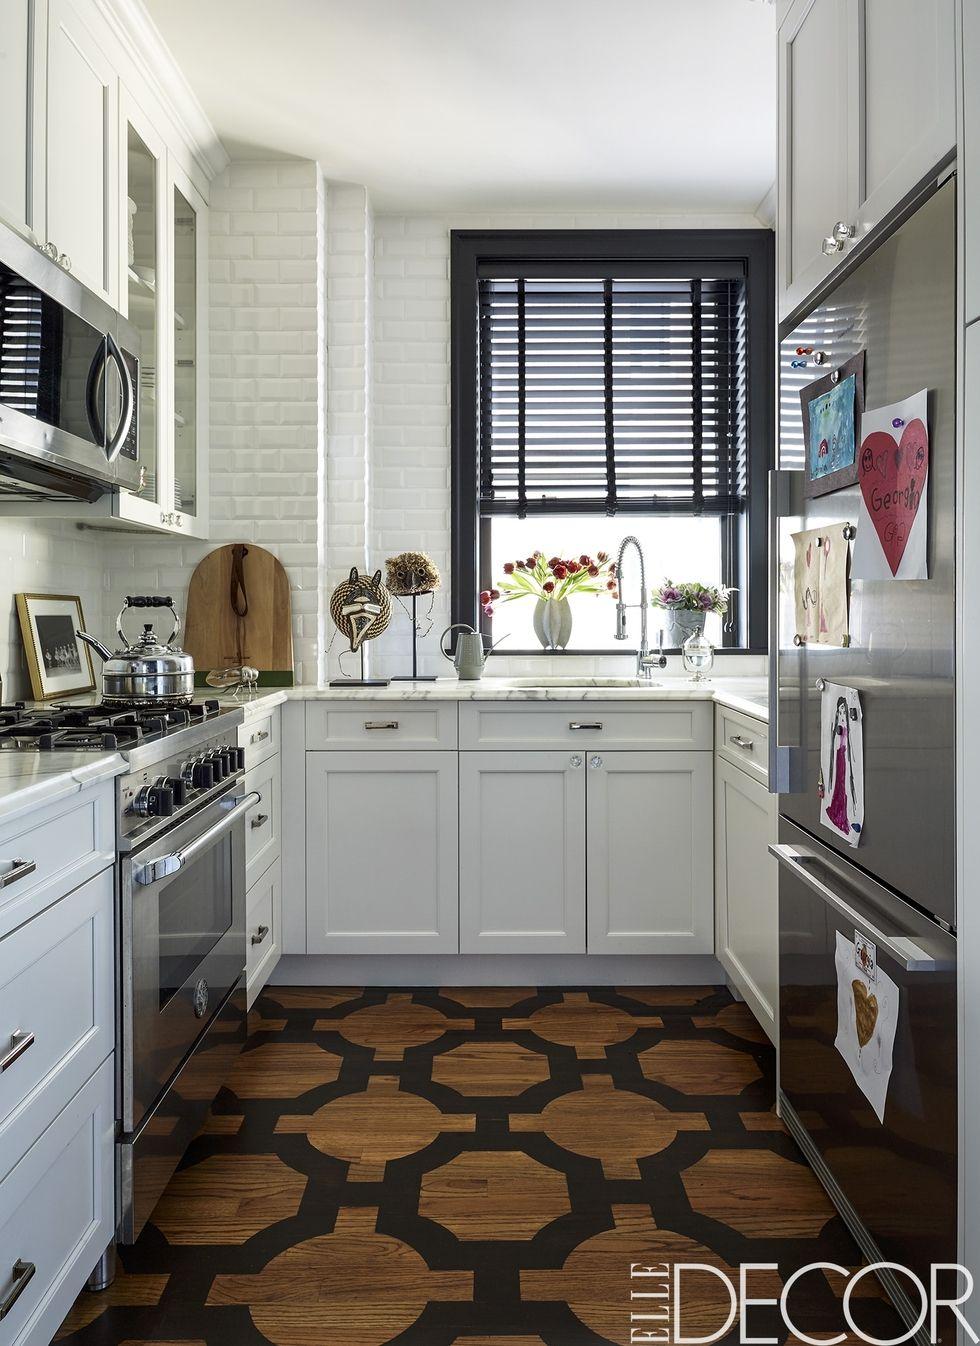 50 small kitchen design ideas - decorating tiny kitchens NGTYLOL